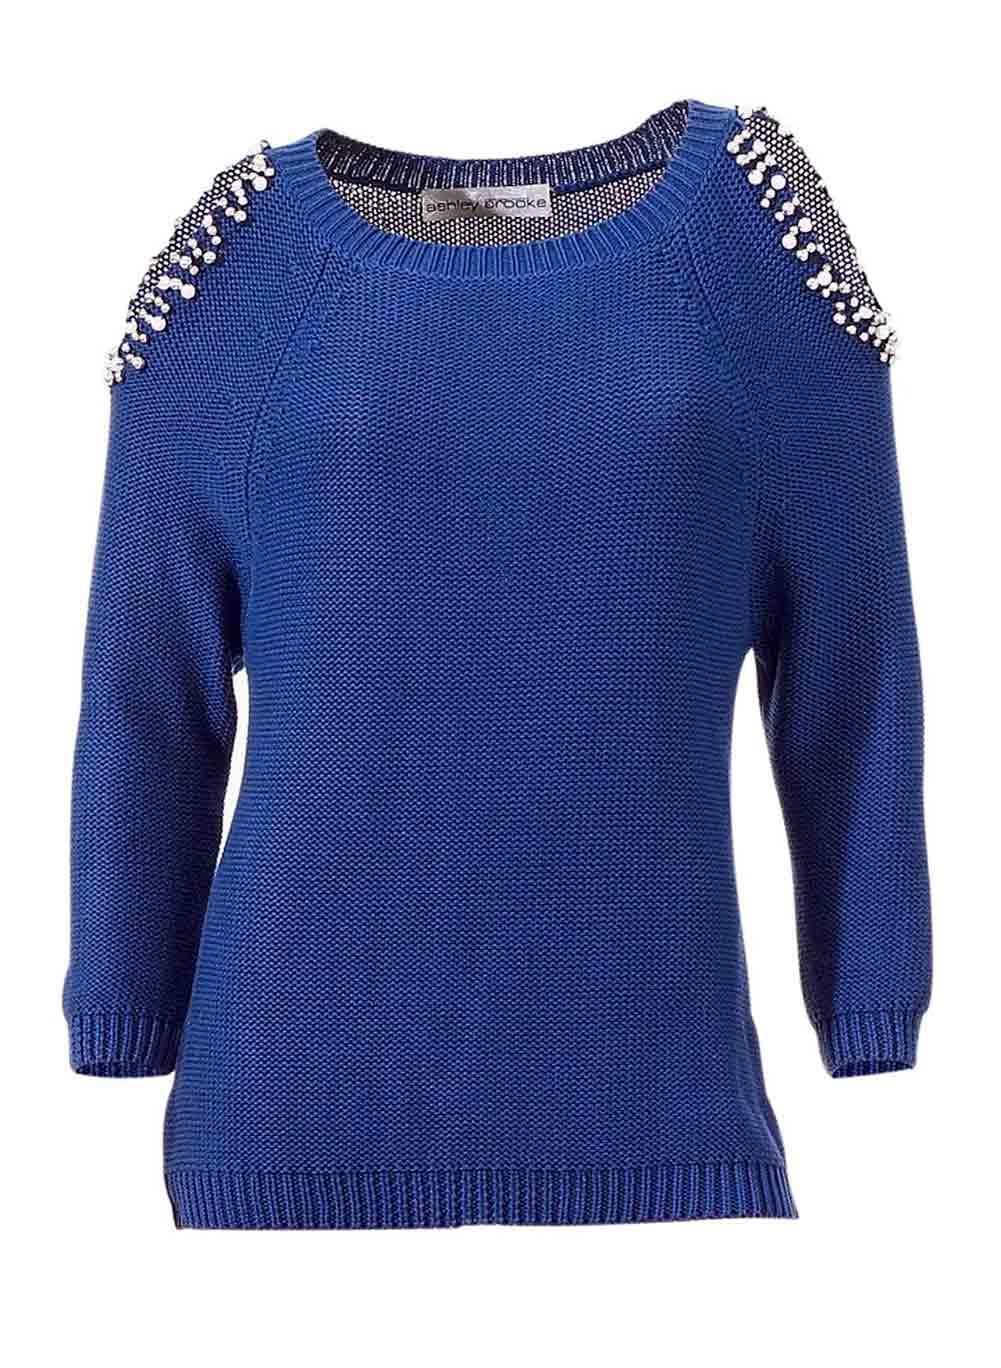 098.370 ASHLEY BROOKE Damen Designer-Pullover m. Perlen Royalblau Cut Outs Edel